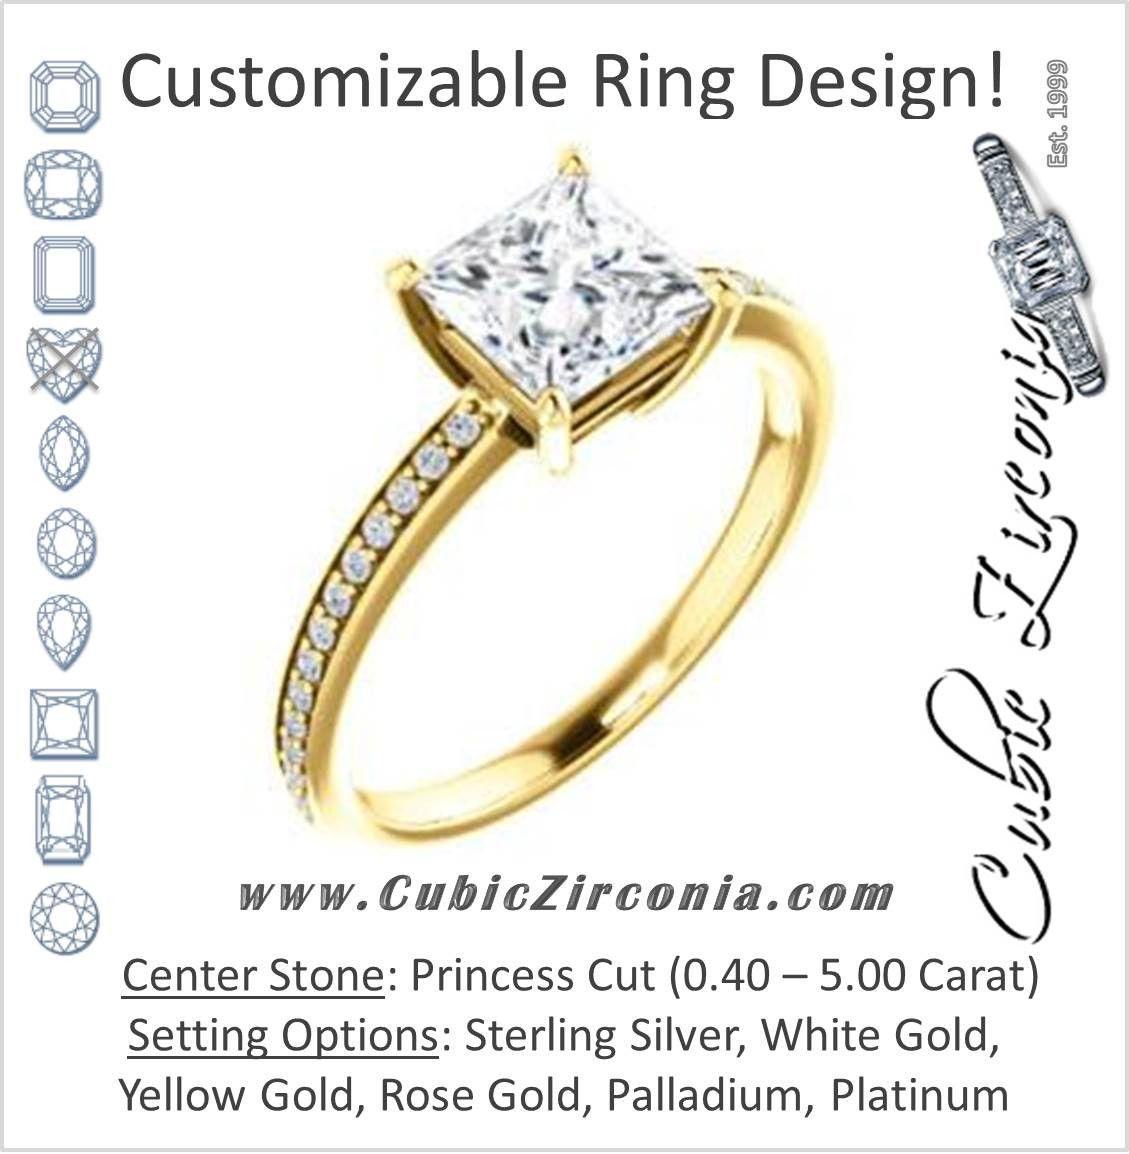 Cubic zirconia engagement ring the majo jimena customizable